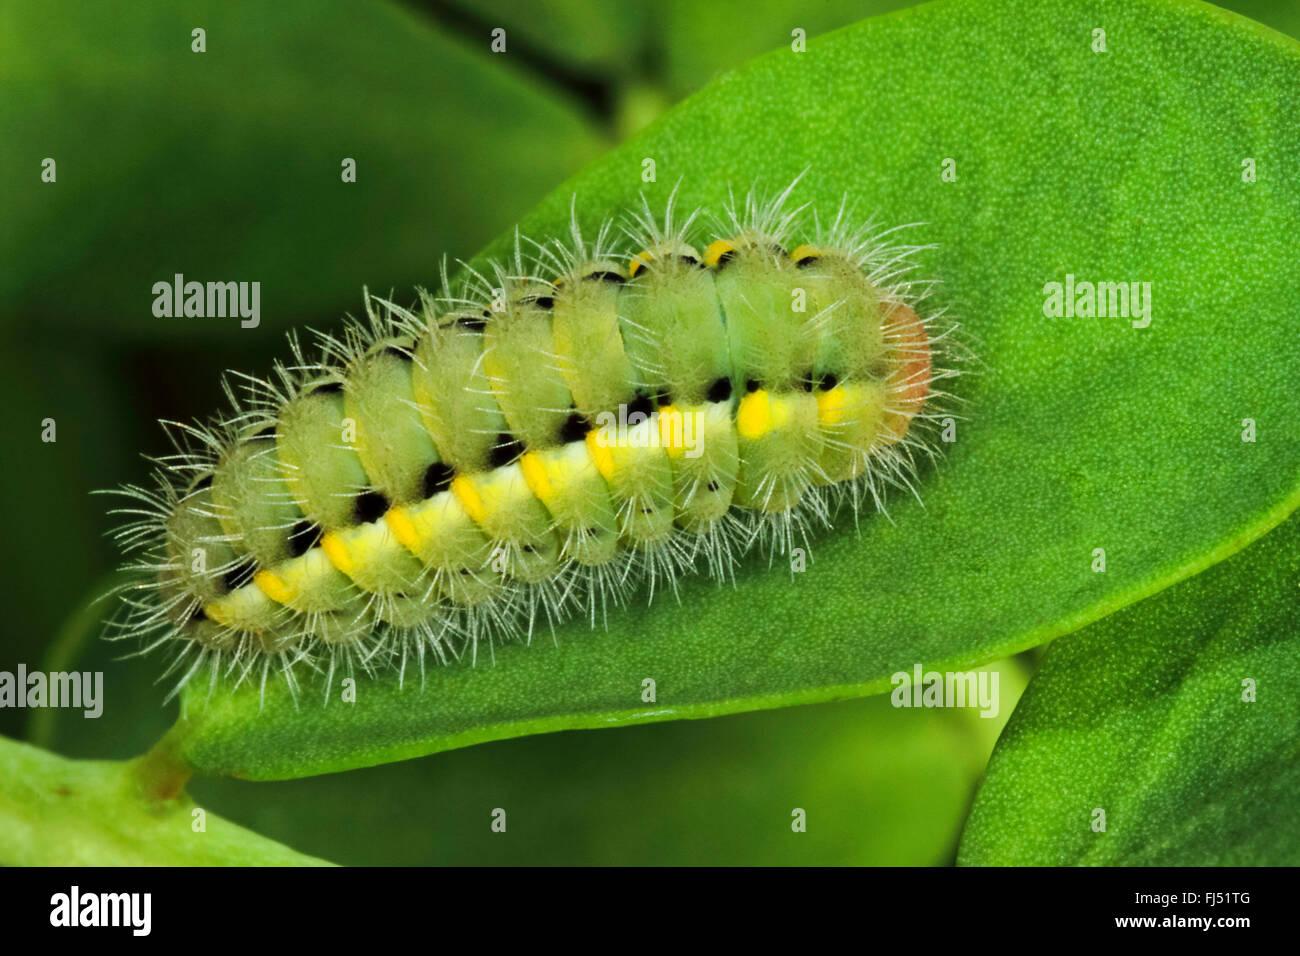 Auspicious Burnet Moth (Zygaena fausta, Zygaena faustina), caterpillar on a leaf, Germany - Stock Image